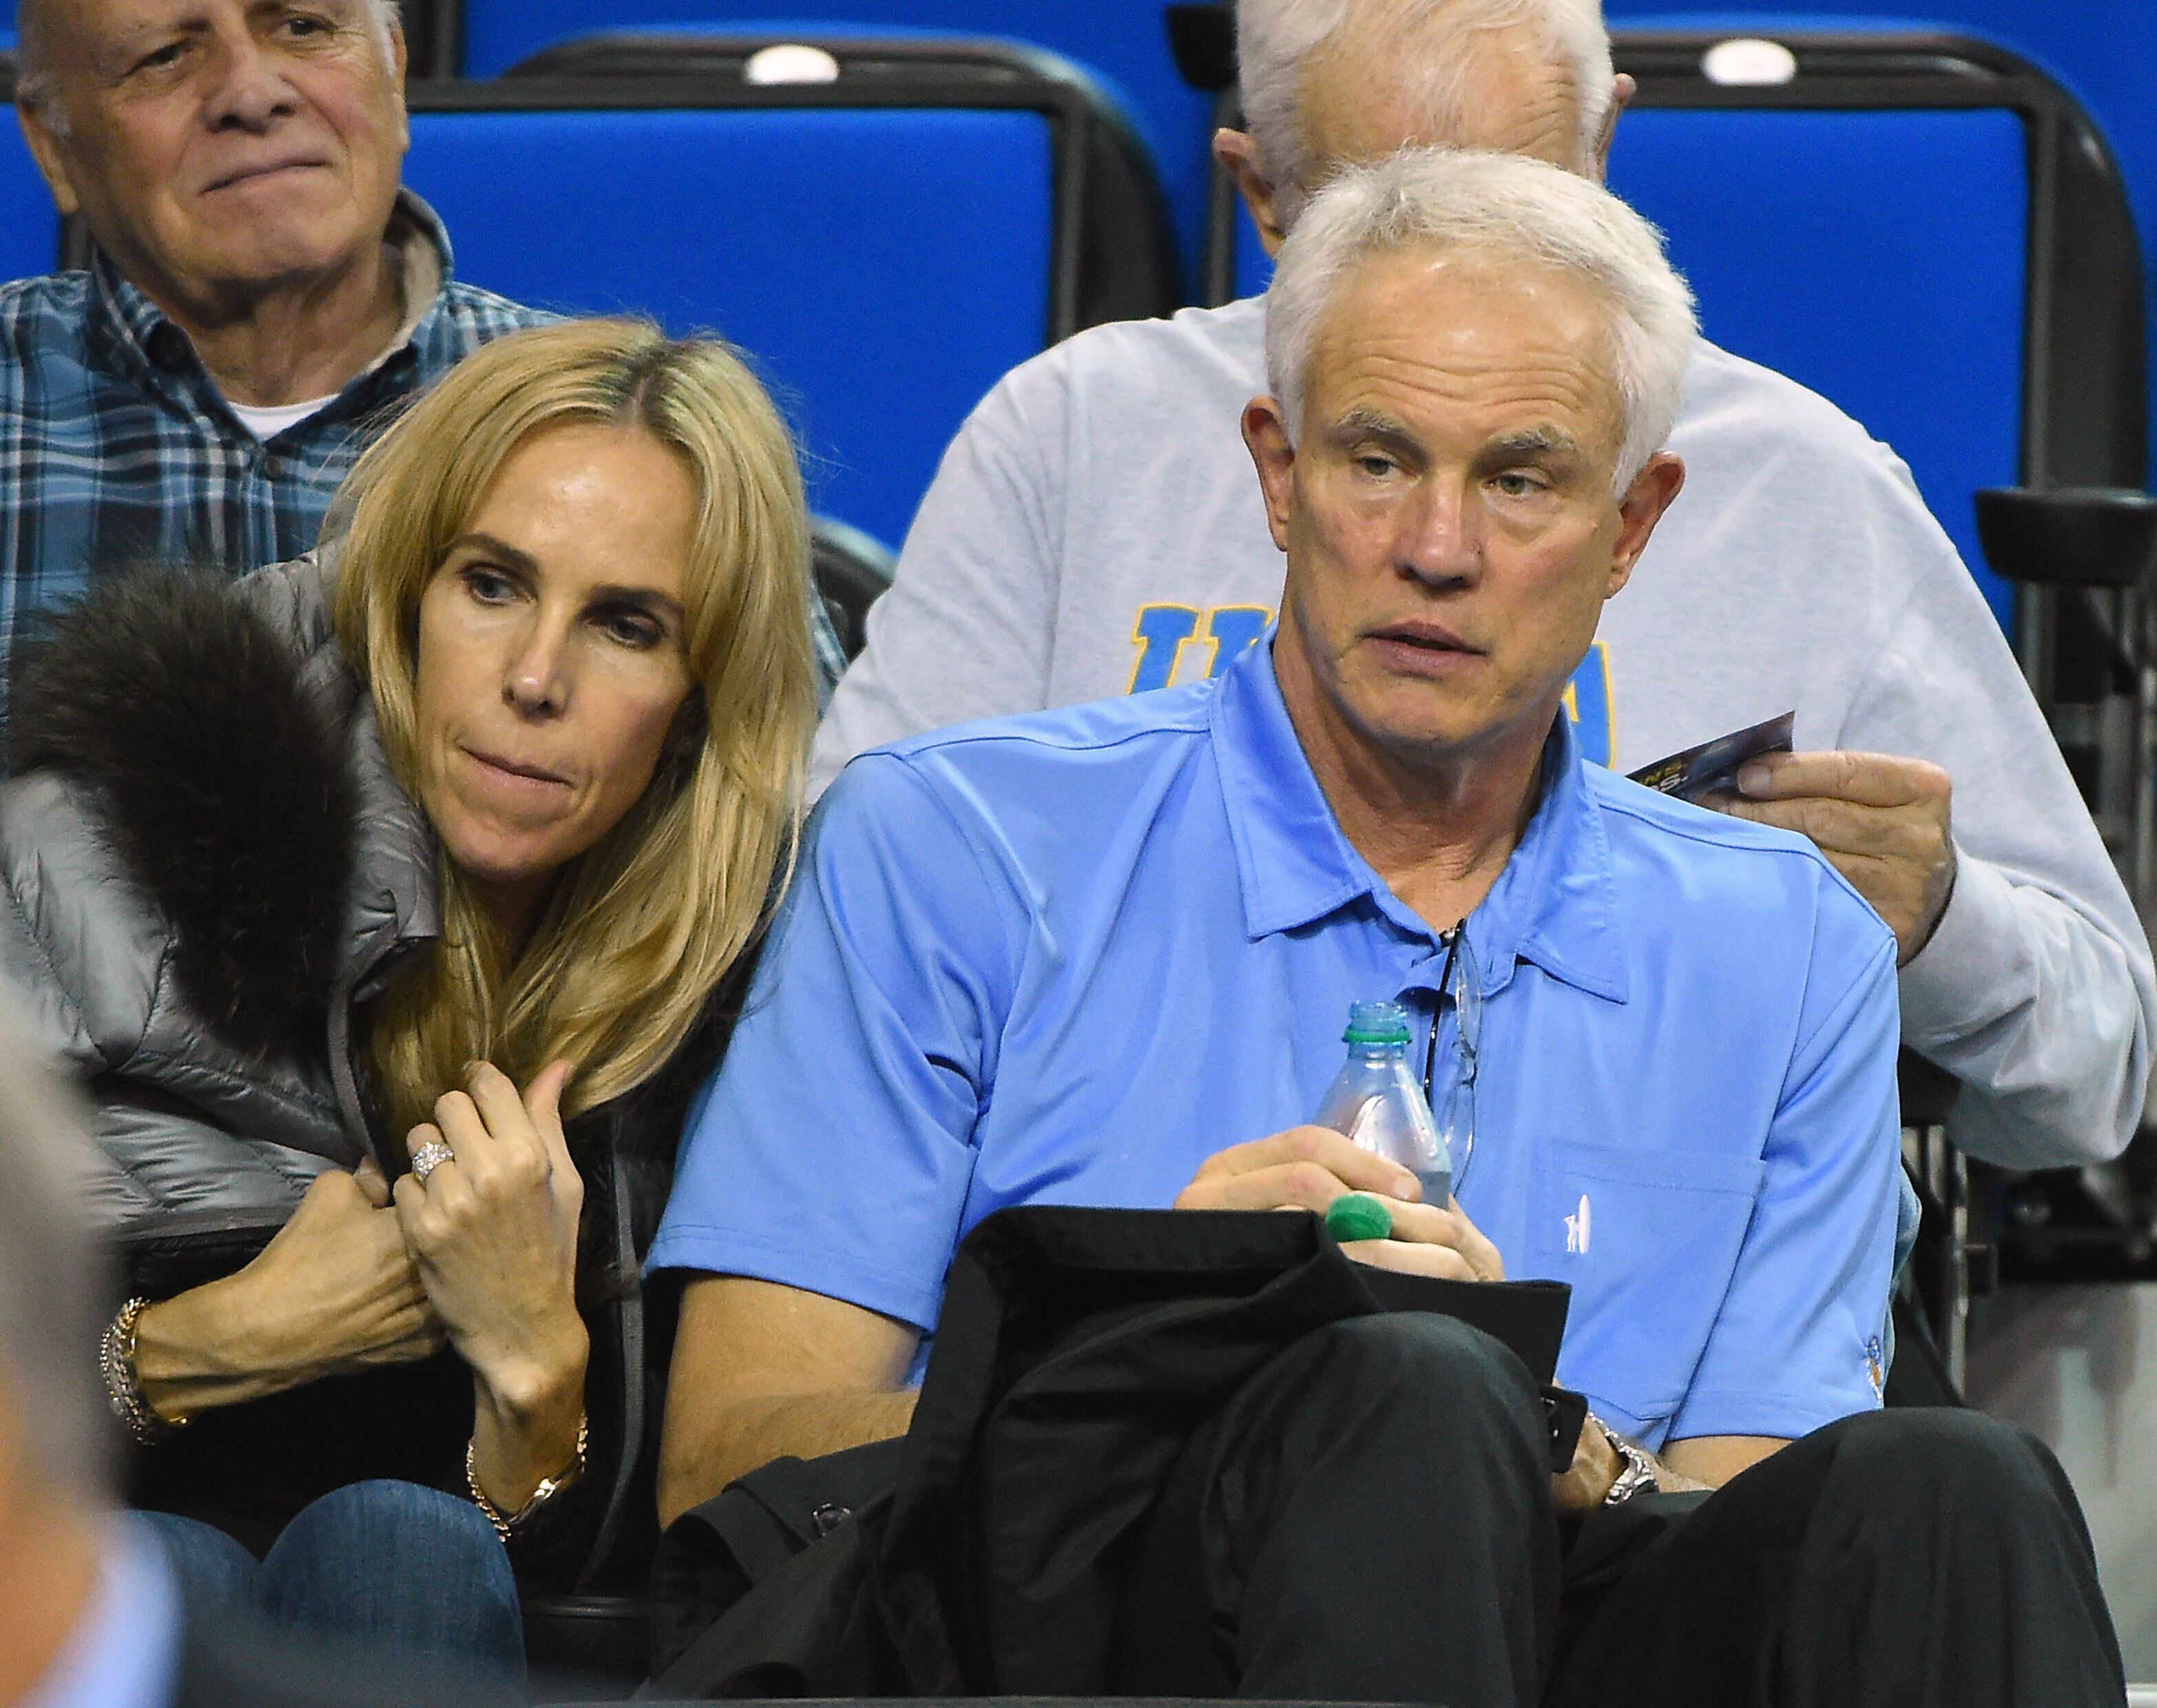 North Carolina Tar Heels Lakers Fire Mitch Kupchak as GM